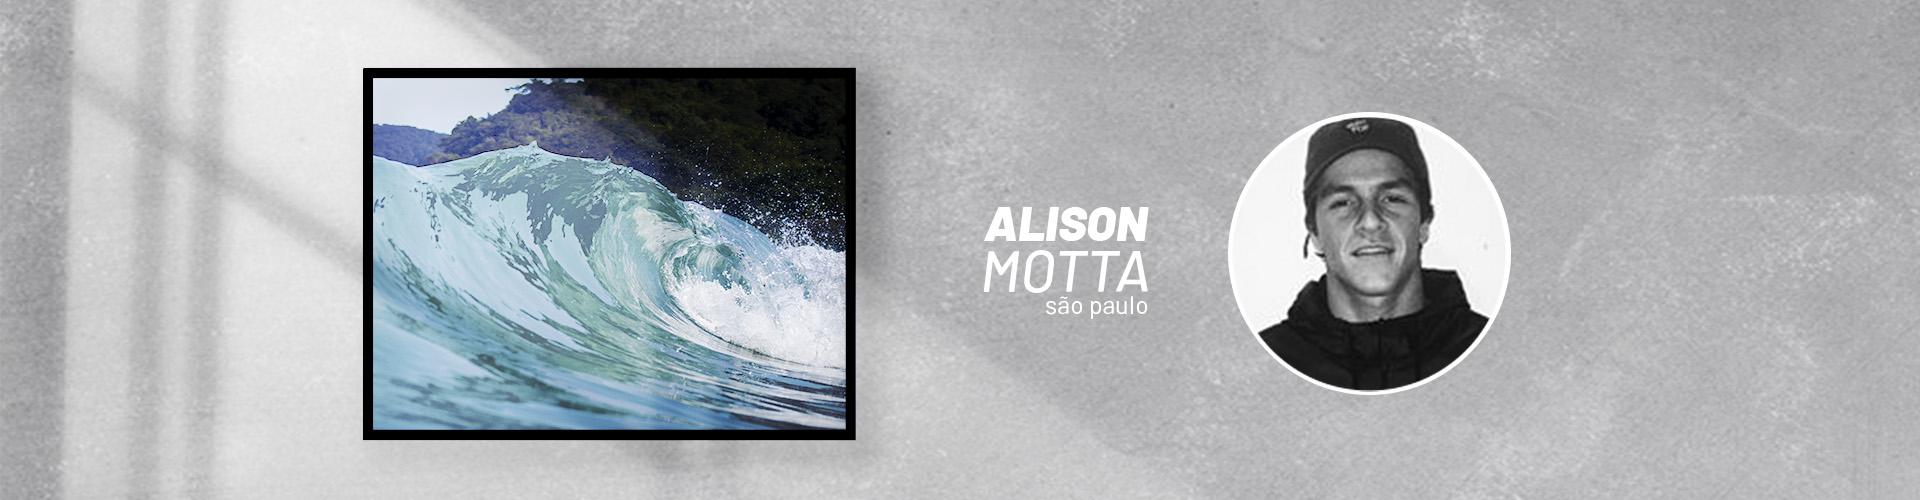 Página Artista | Fotógrafo Alison Motta